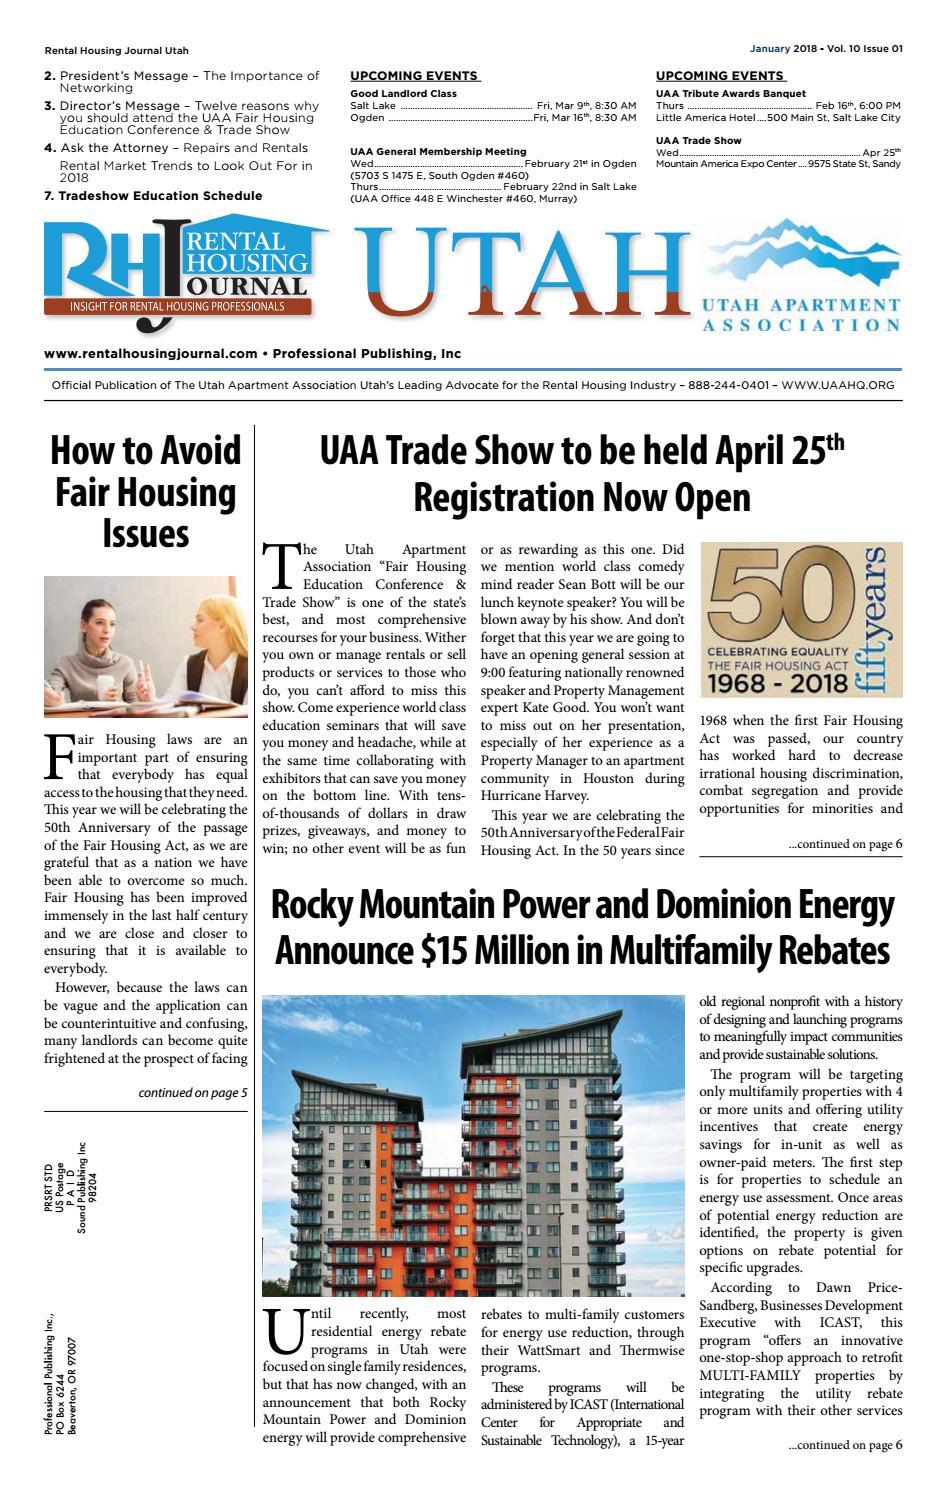 Rental Housing Journal Utah January 2018 by Professional